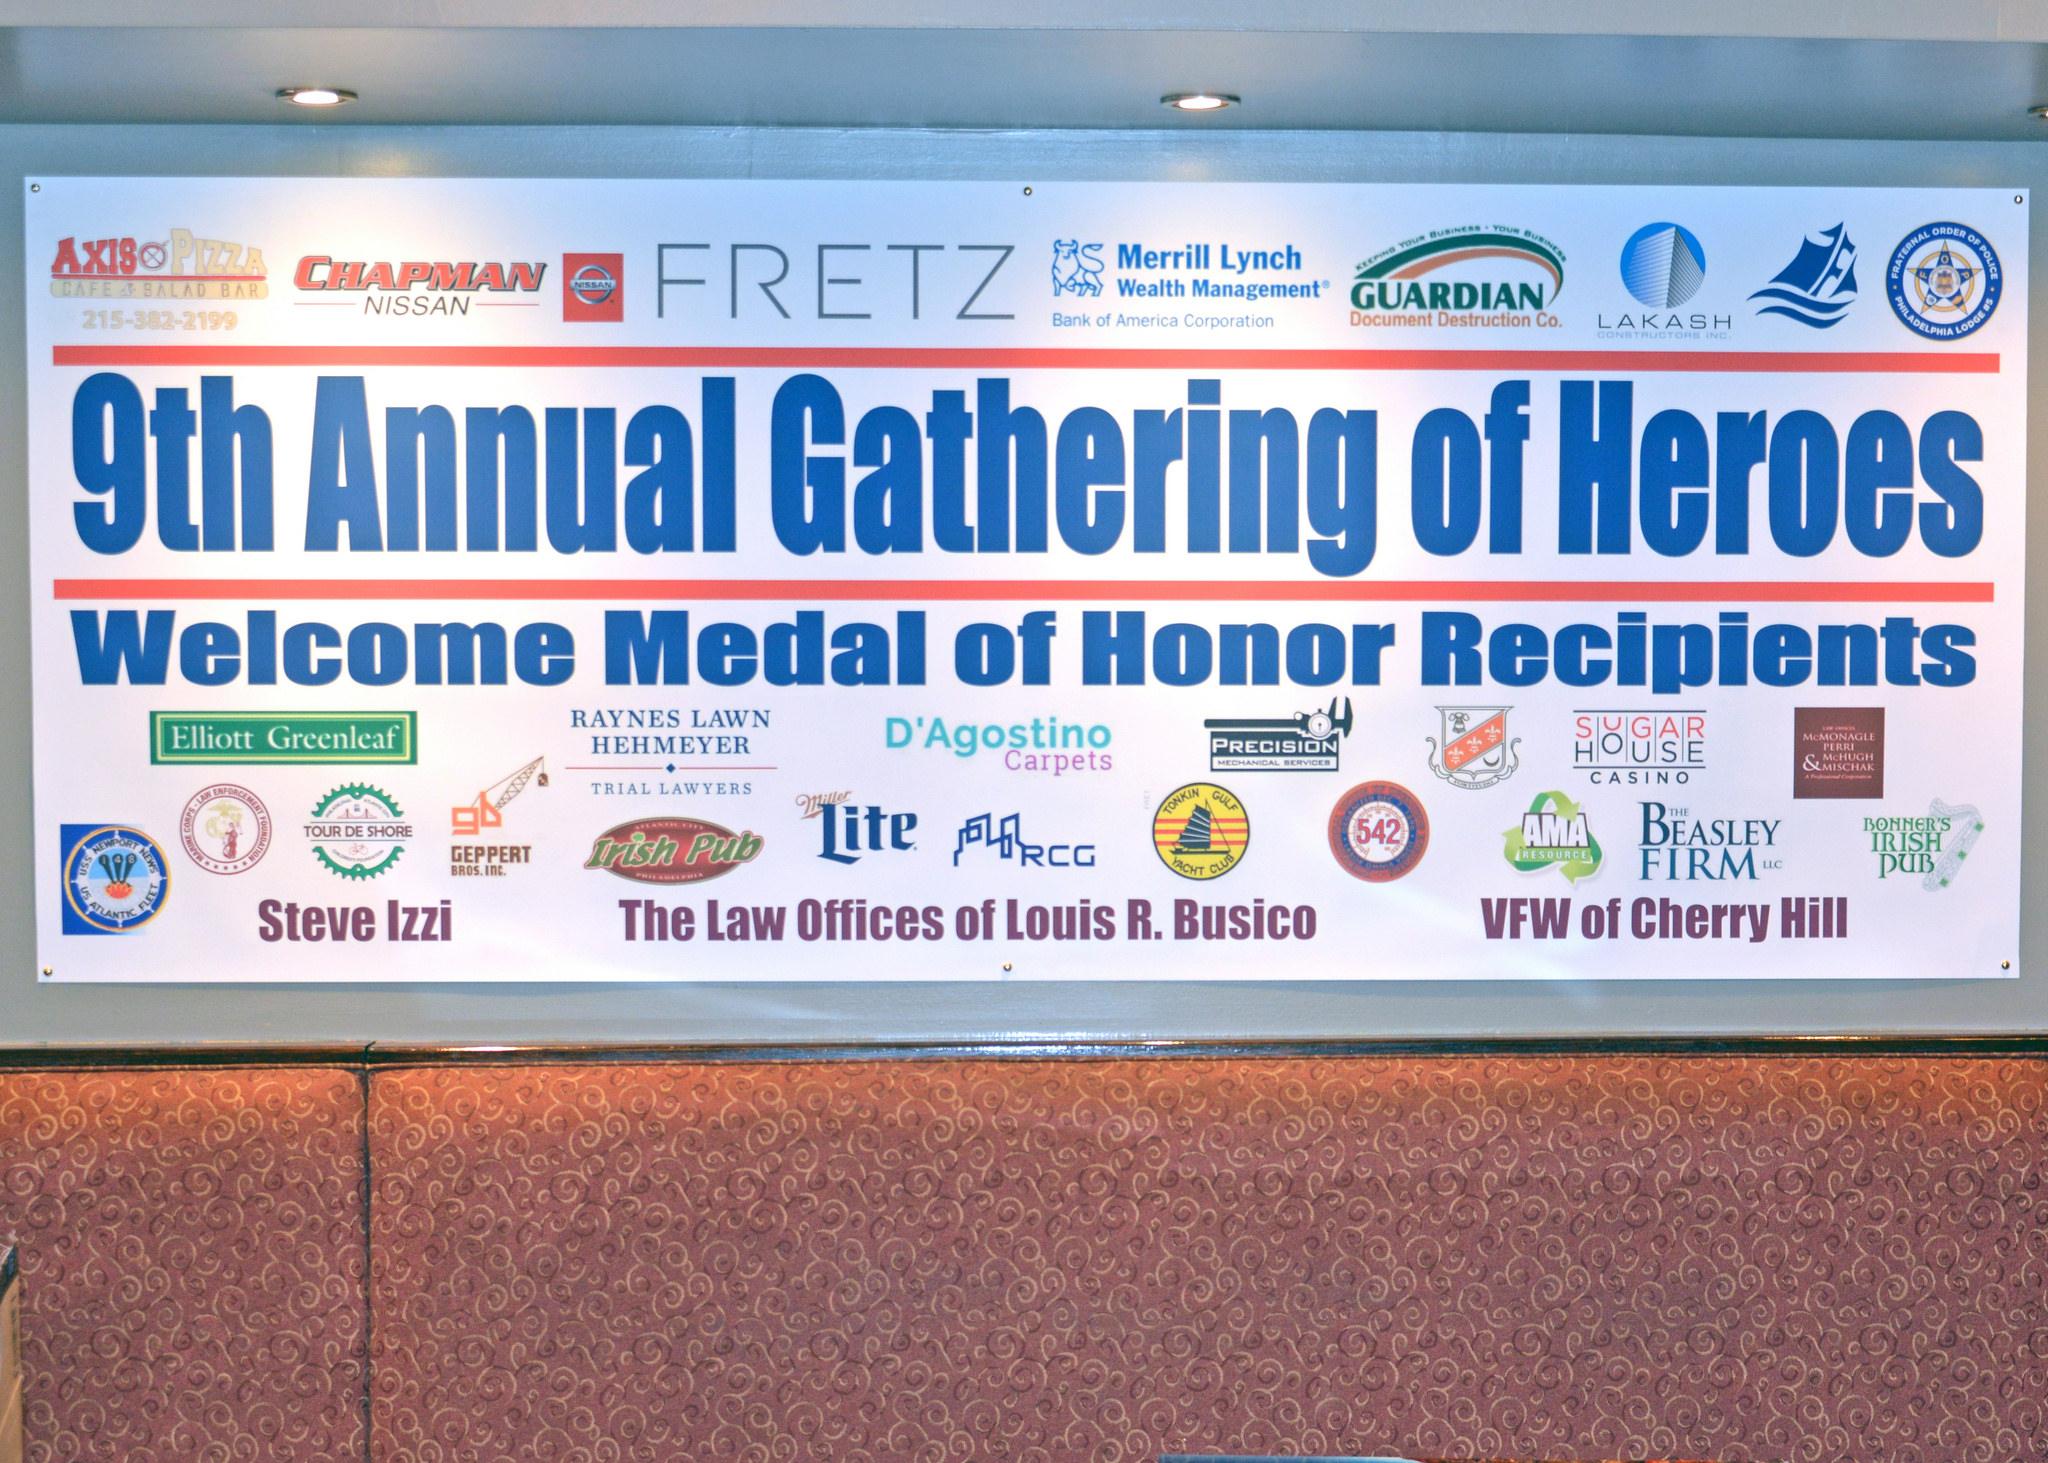 Gathering of Heroes 2018